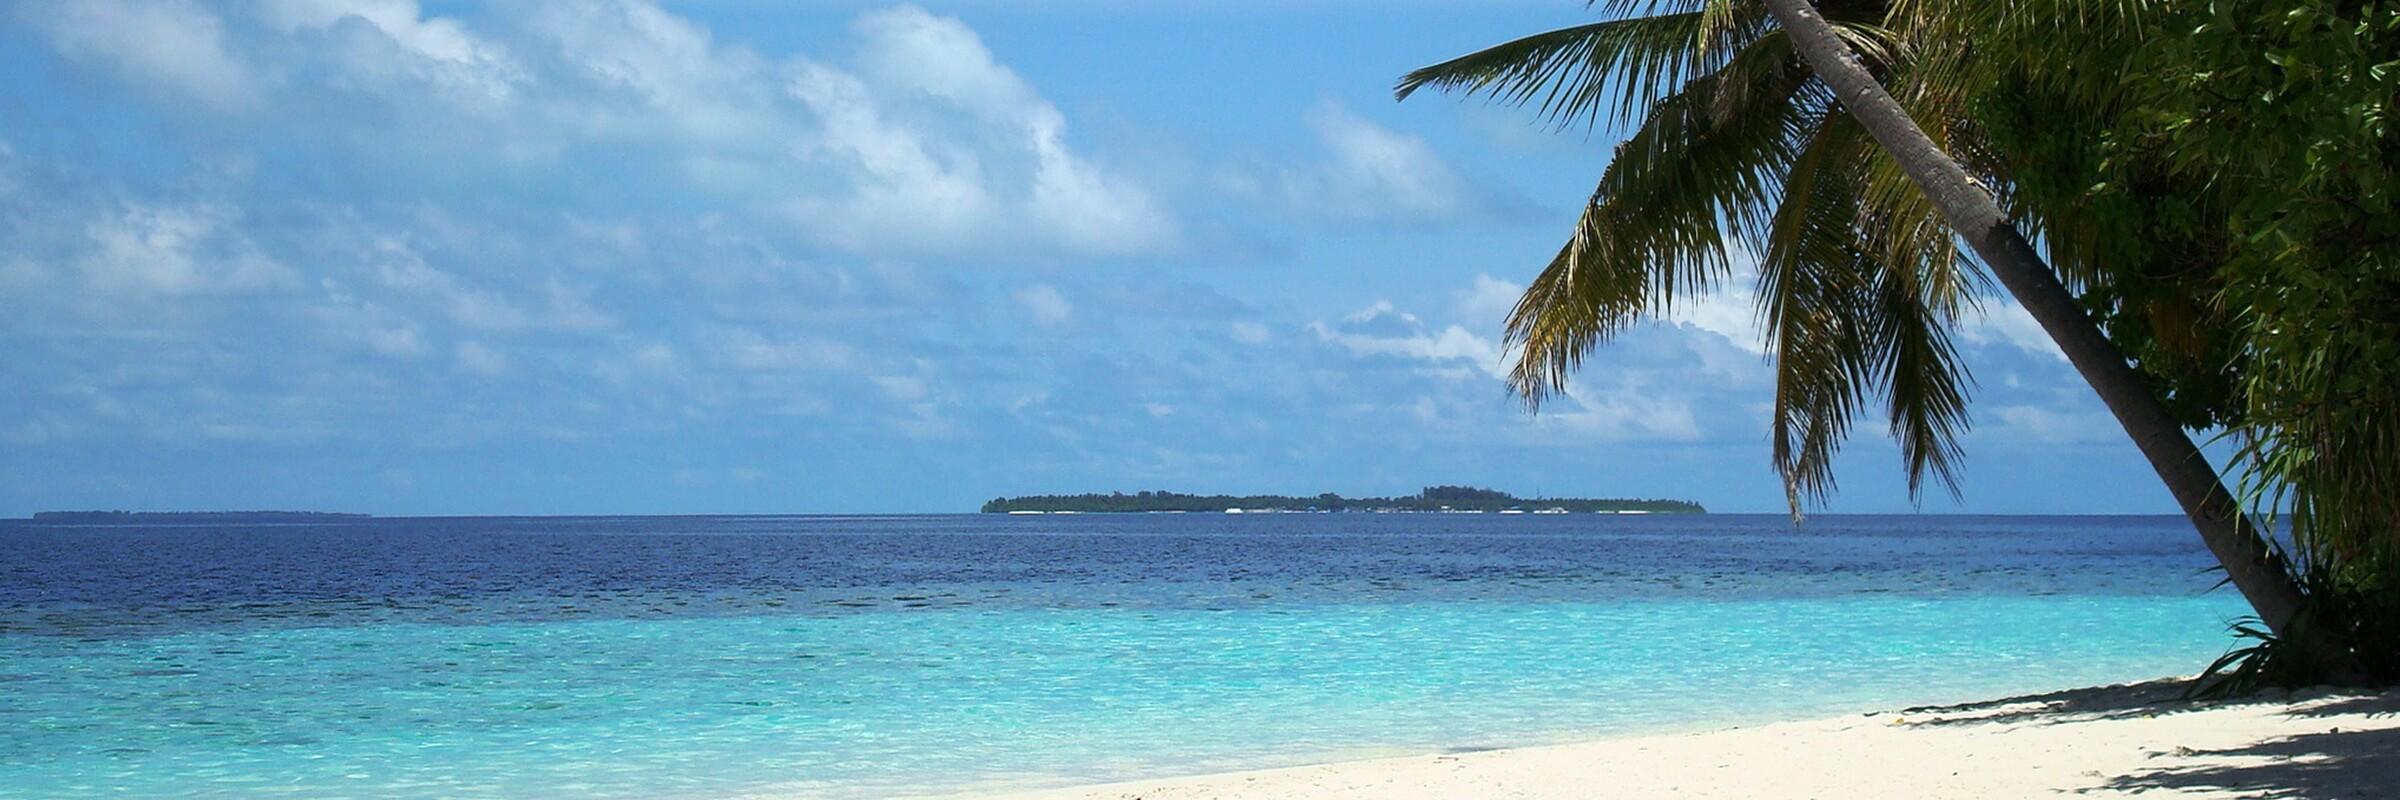 Badehotels Malediven